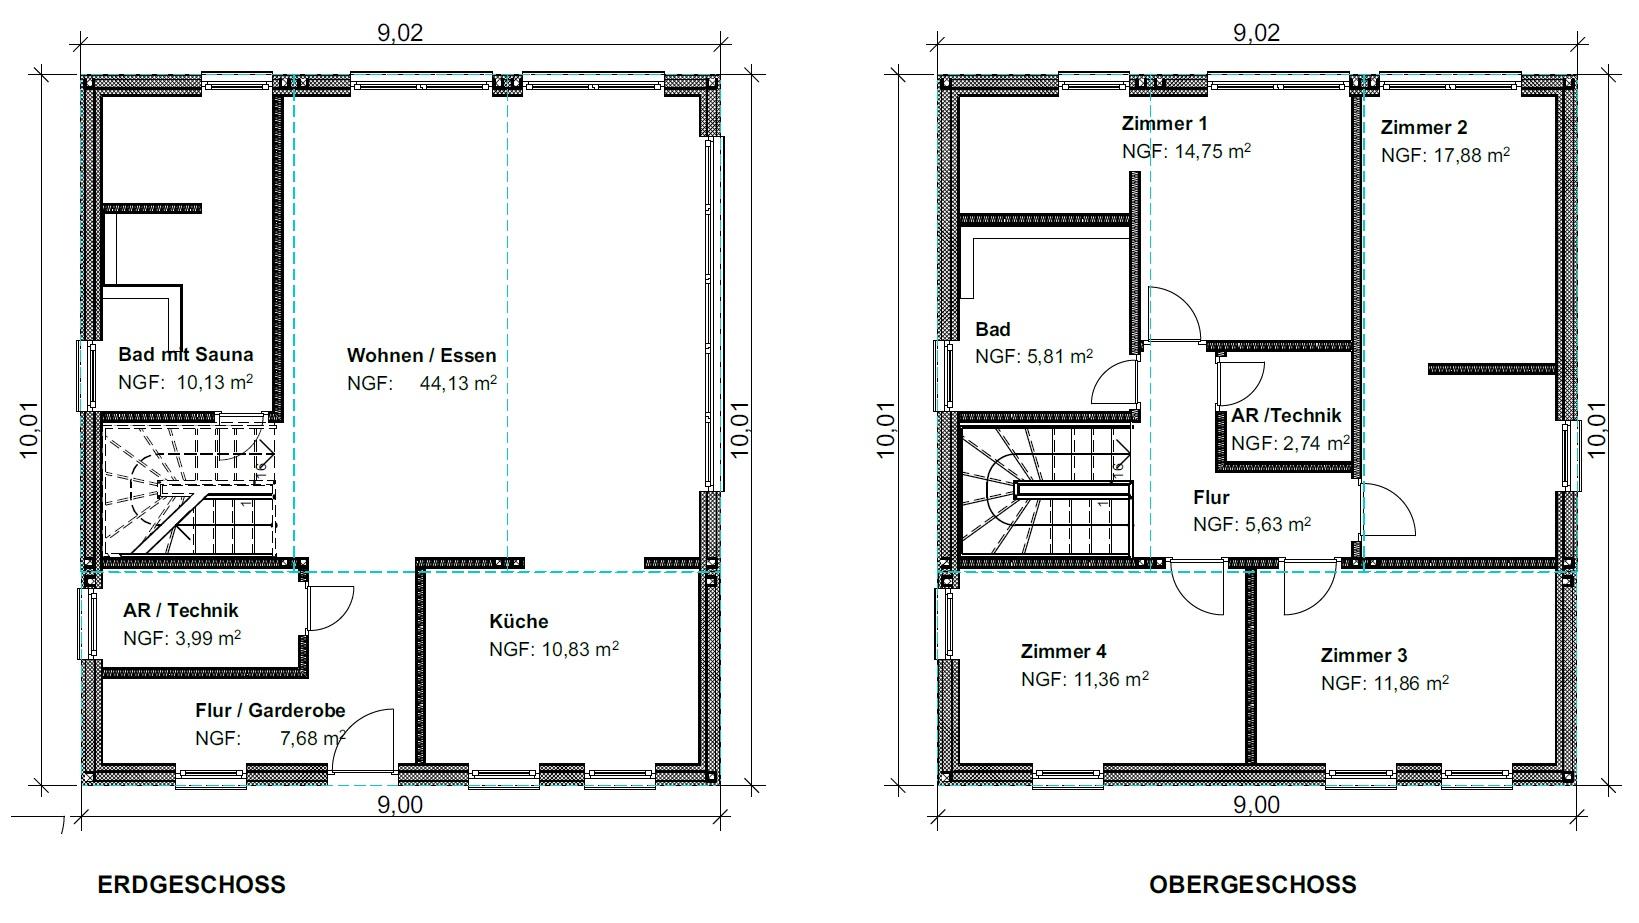 Berühmt Elektrischer Grundriss Layout Fotos - Schaltplan Serie ...